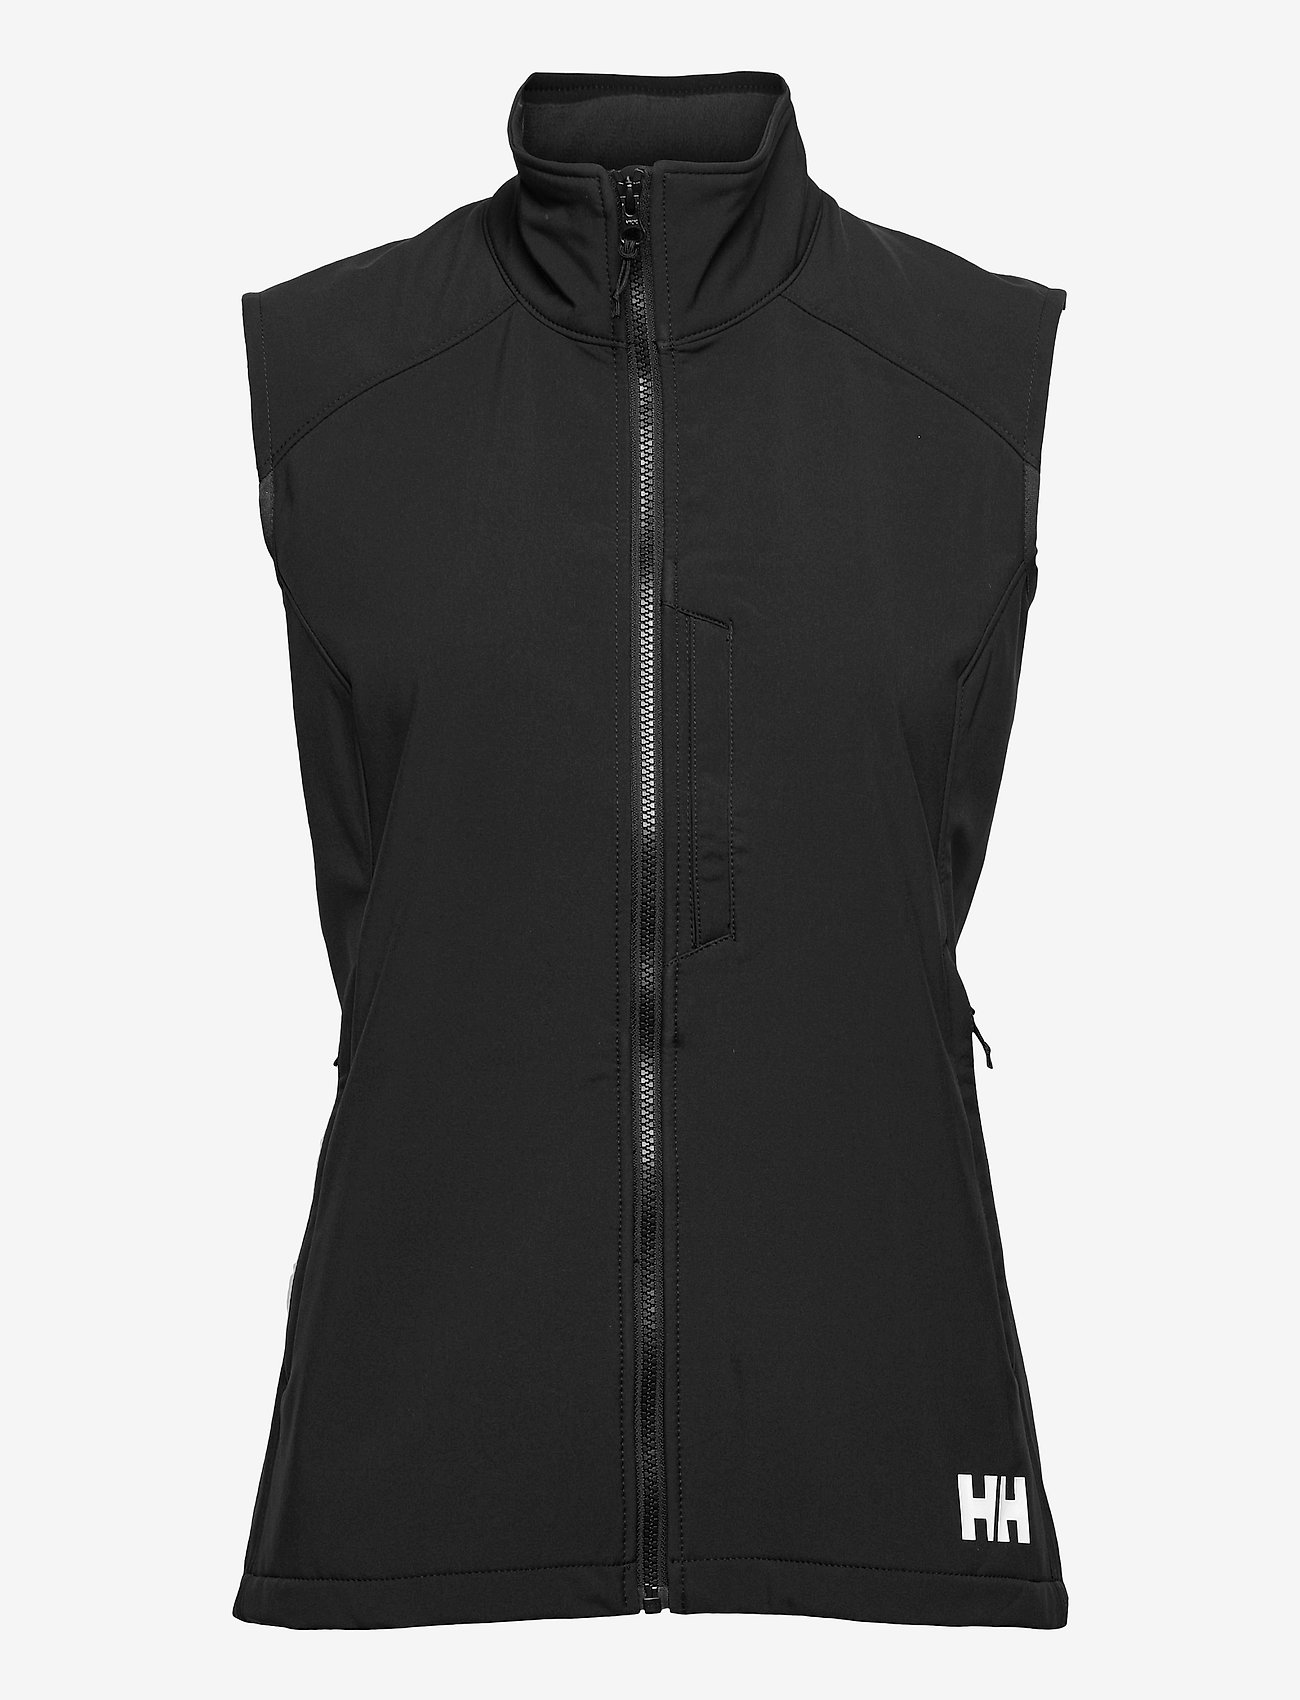 Helly Hansen - W PARAMOUNT SOFTSHELL VEST - puffer vests - 990 black - 1